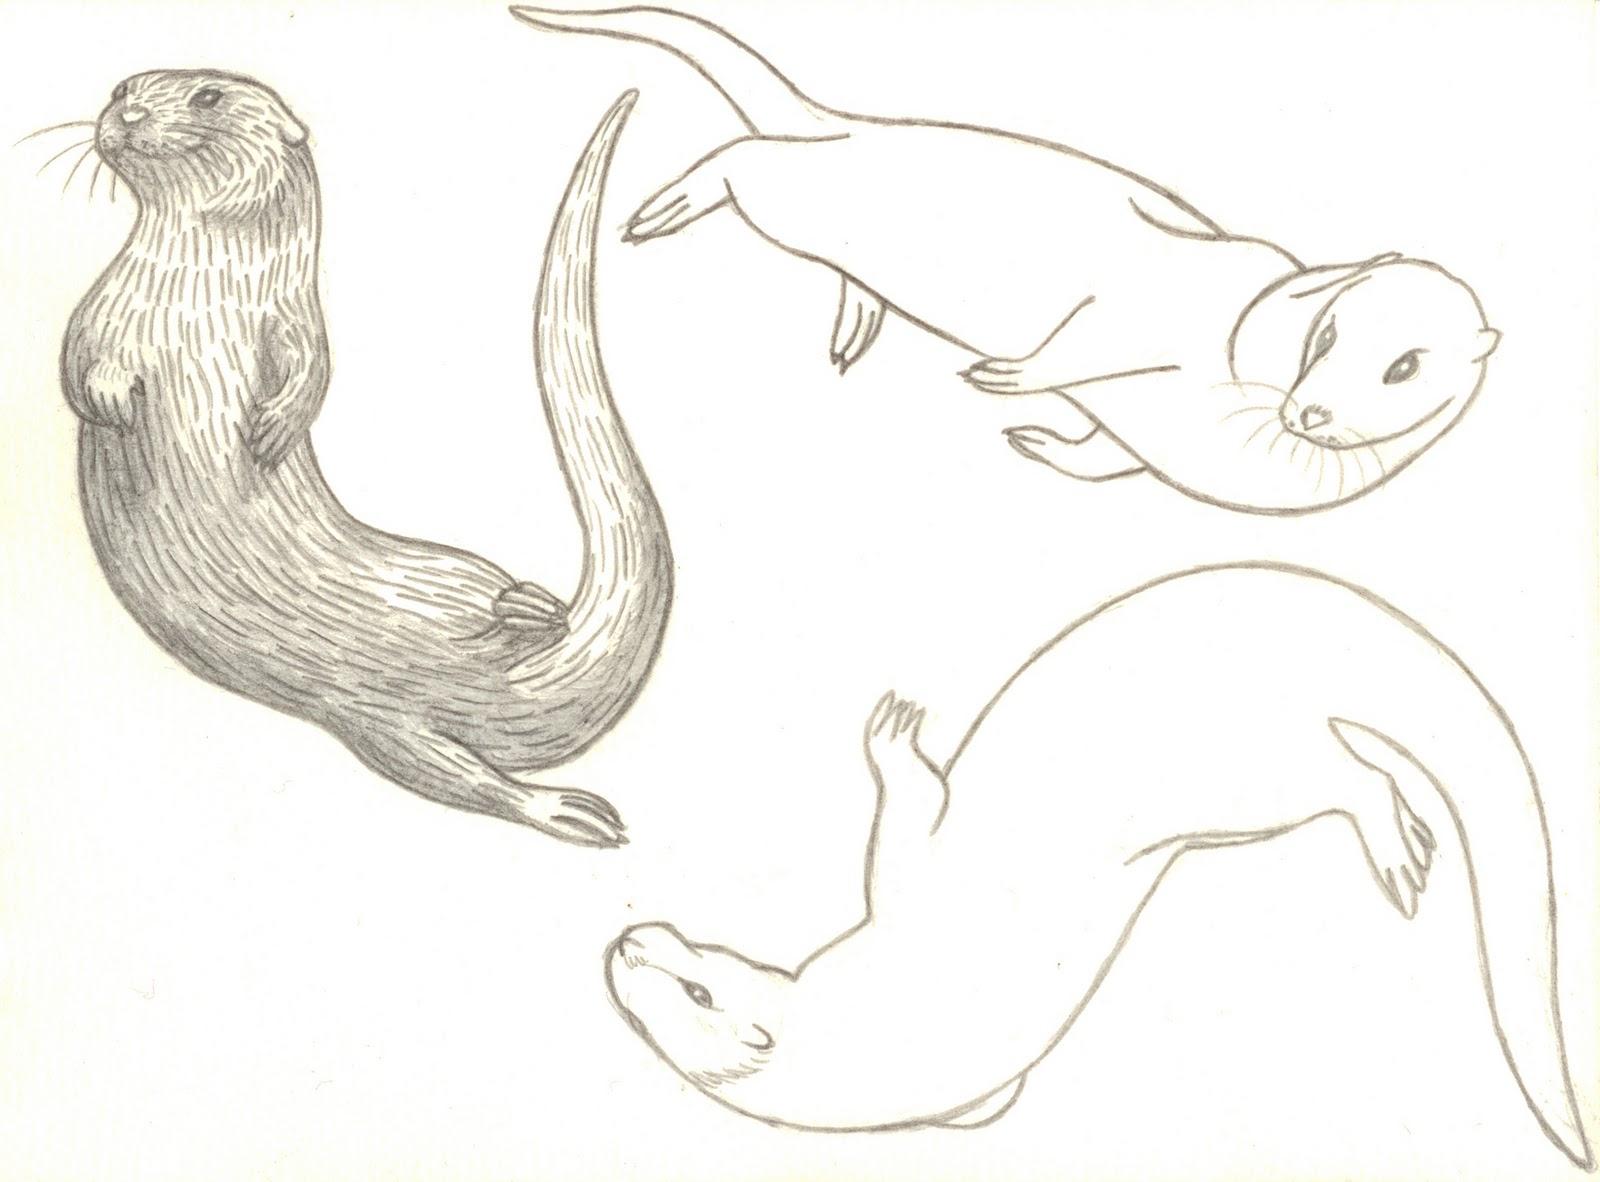 Drawn otter Swimming com com  Drawing